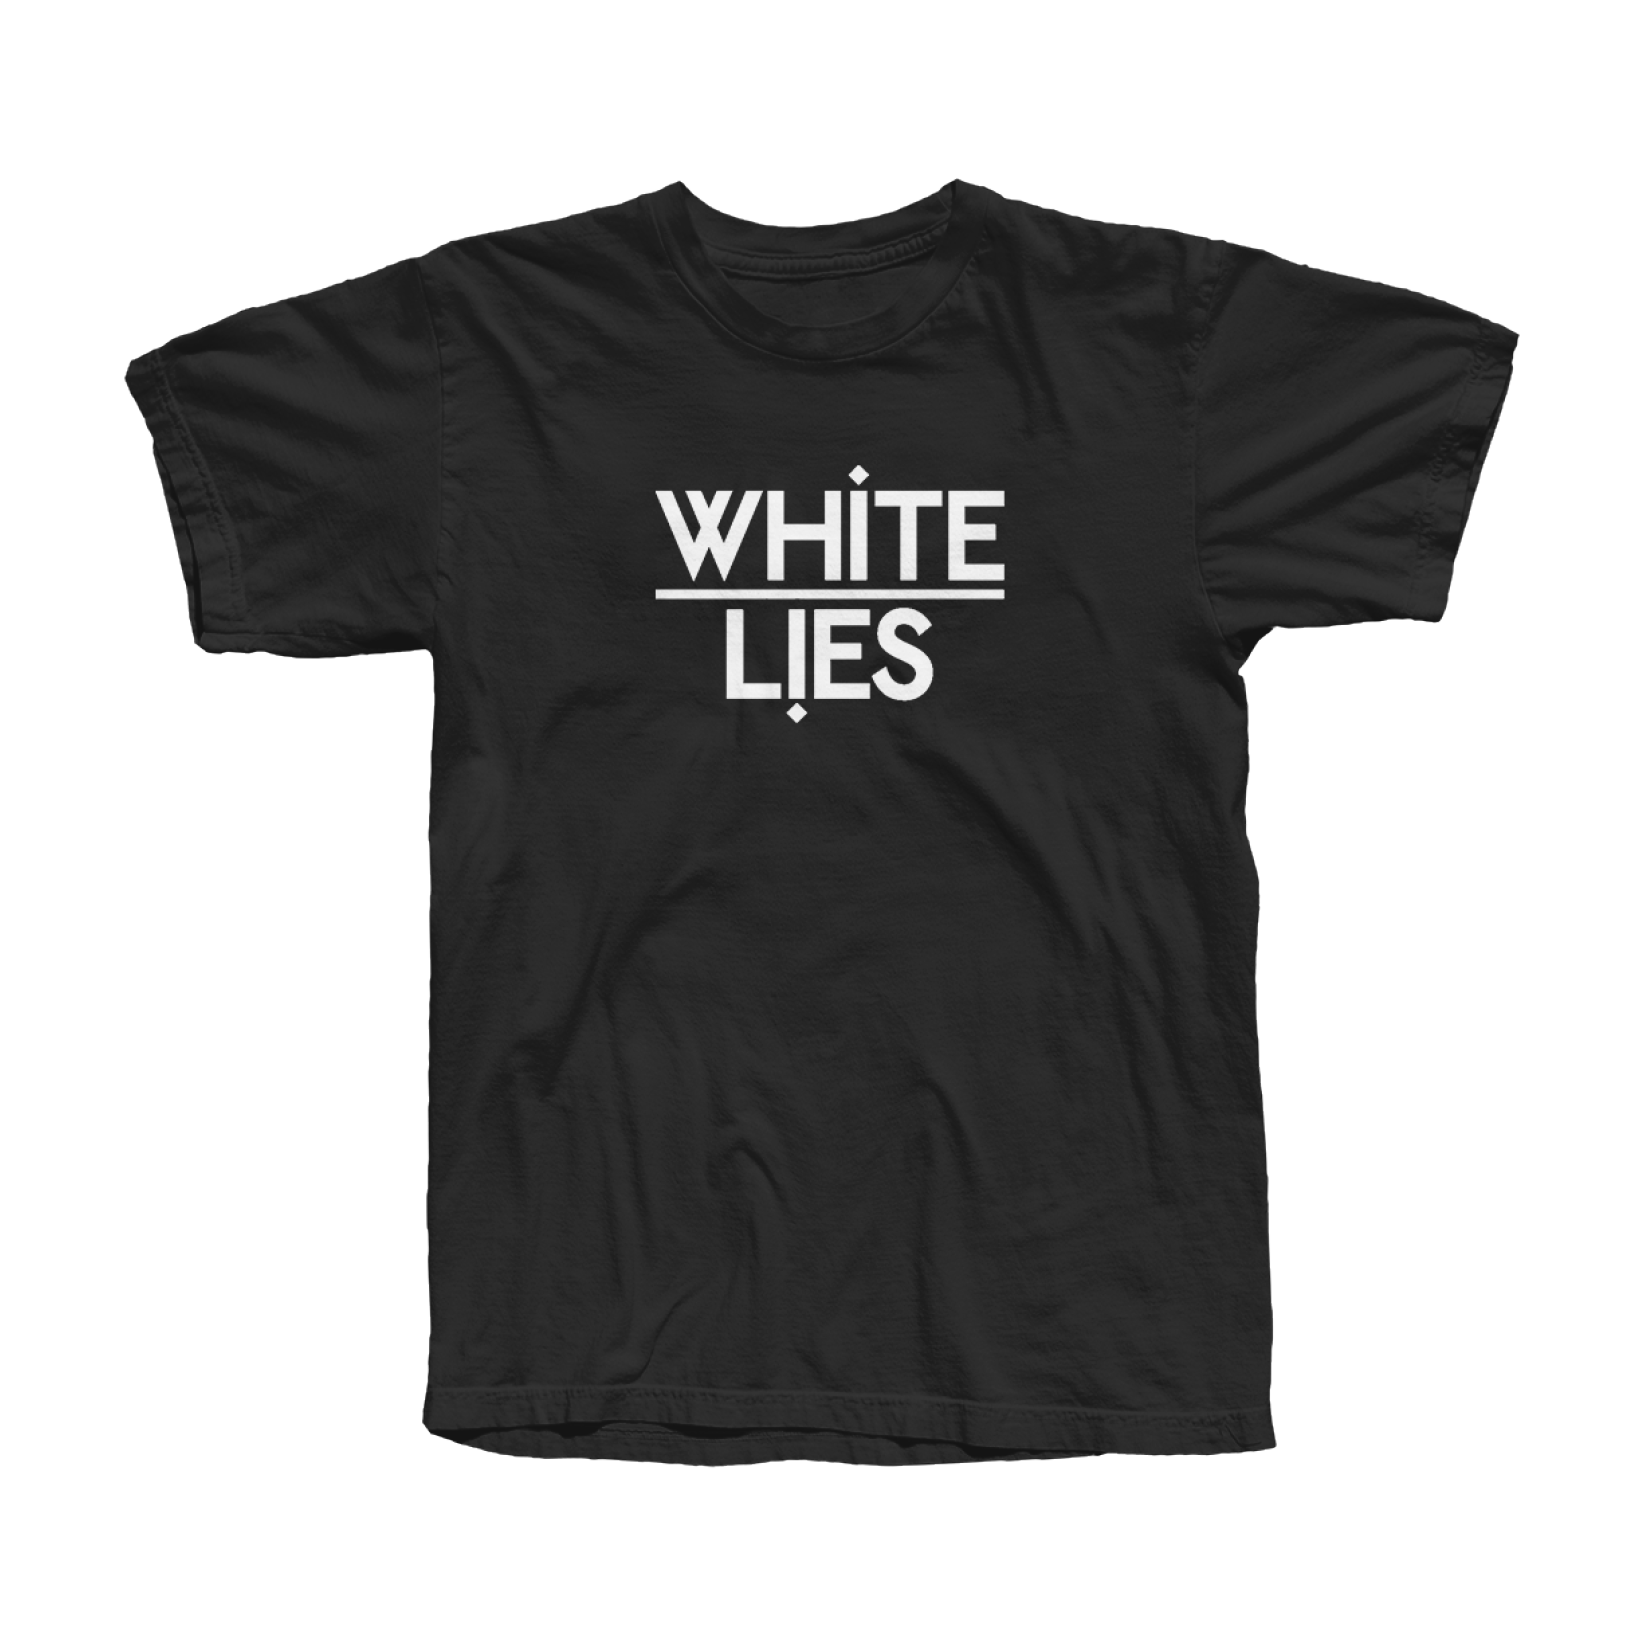 Men's Classic Logo T-shirt - Black - White Lies